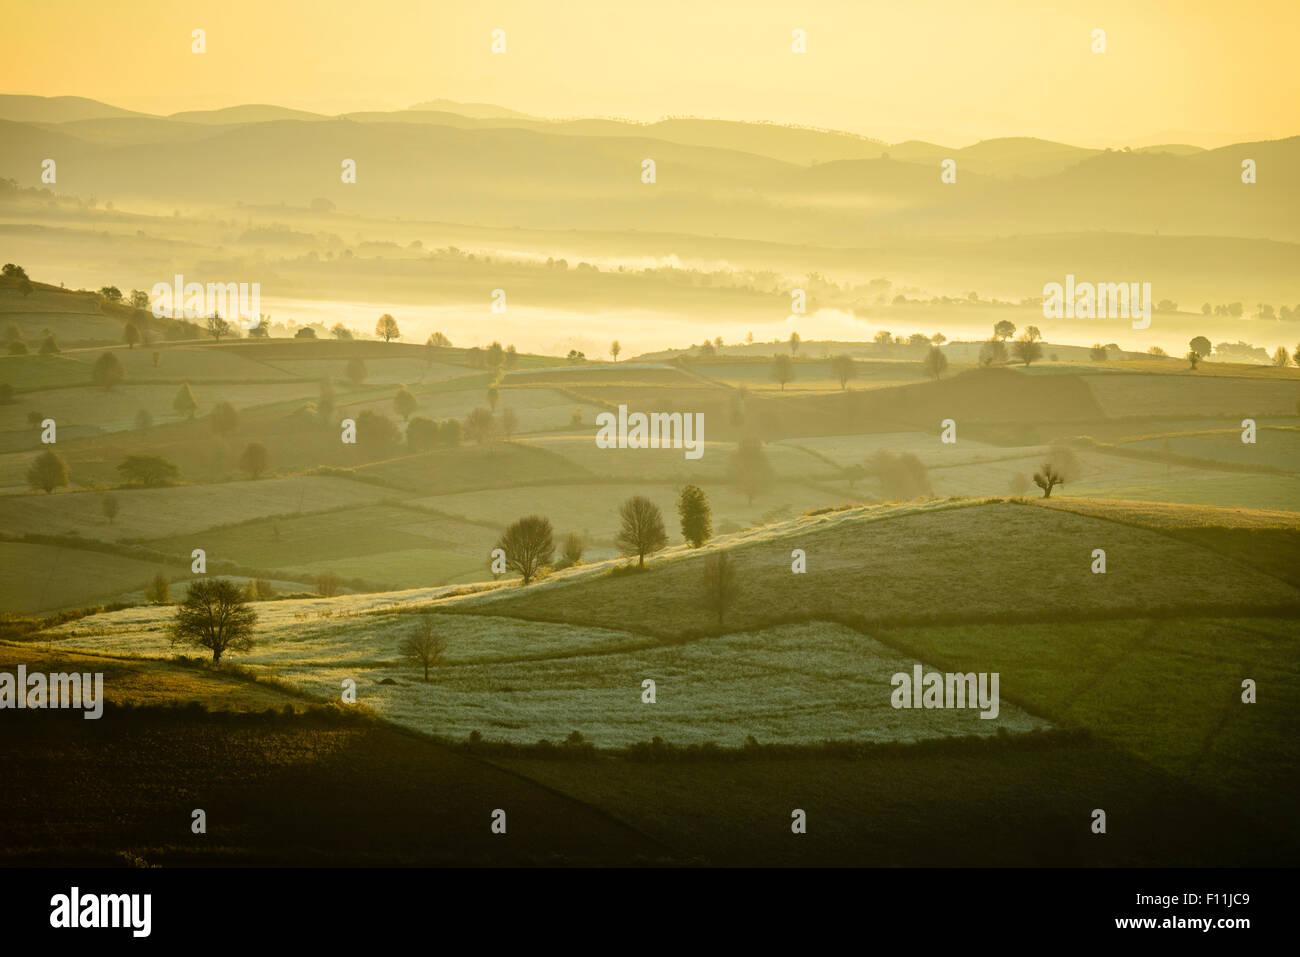 Vista aerea di nebbia in terreni agricoli rurale, Mandalay Myanmar Immagini Stock